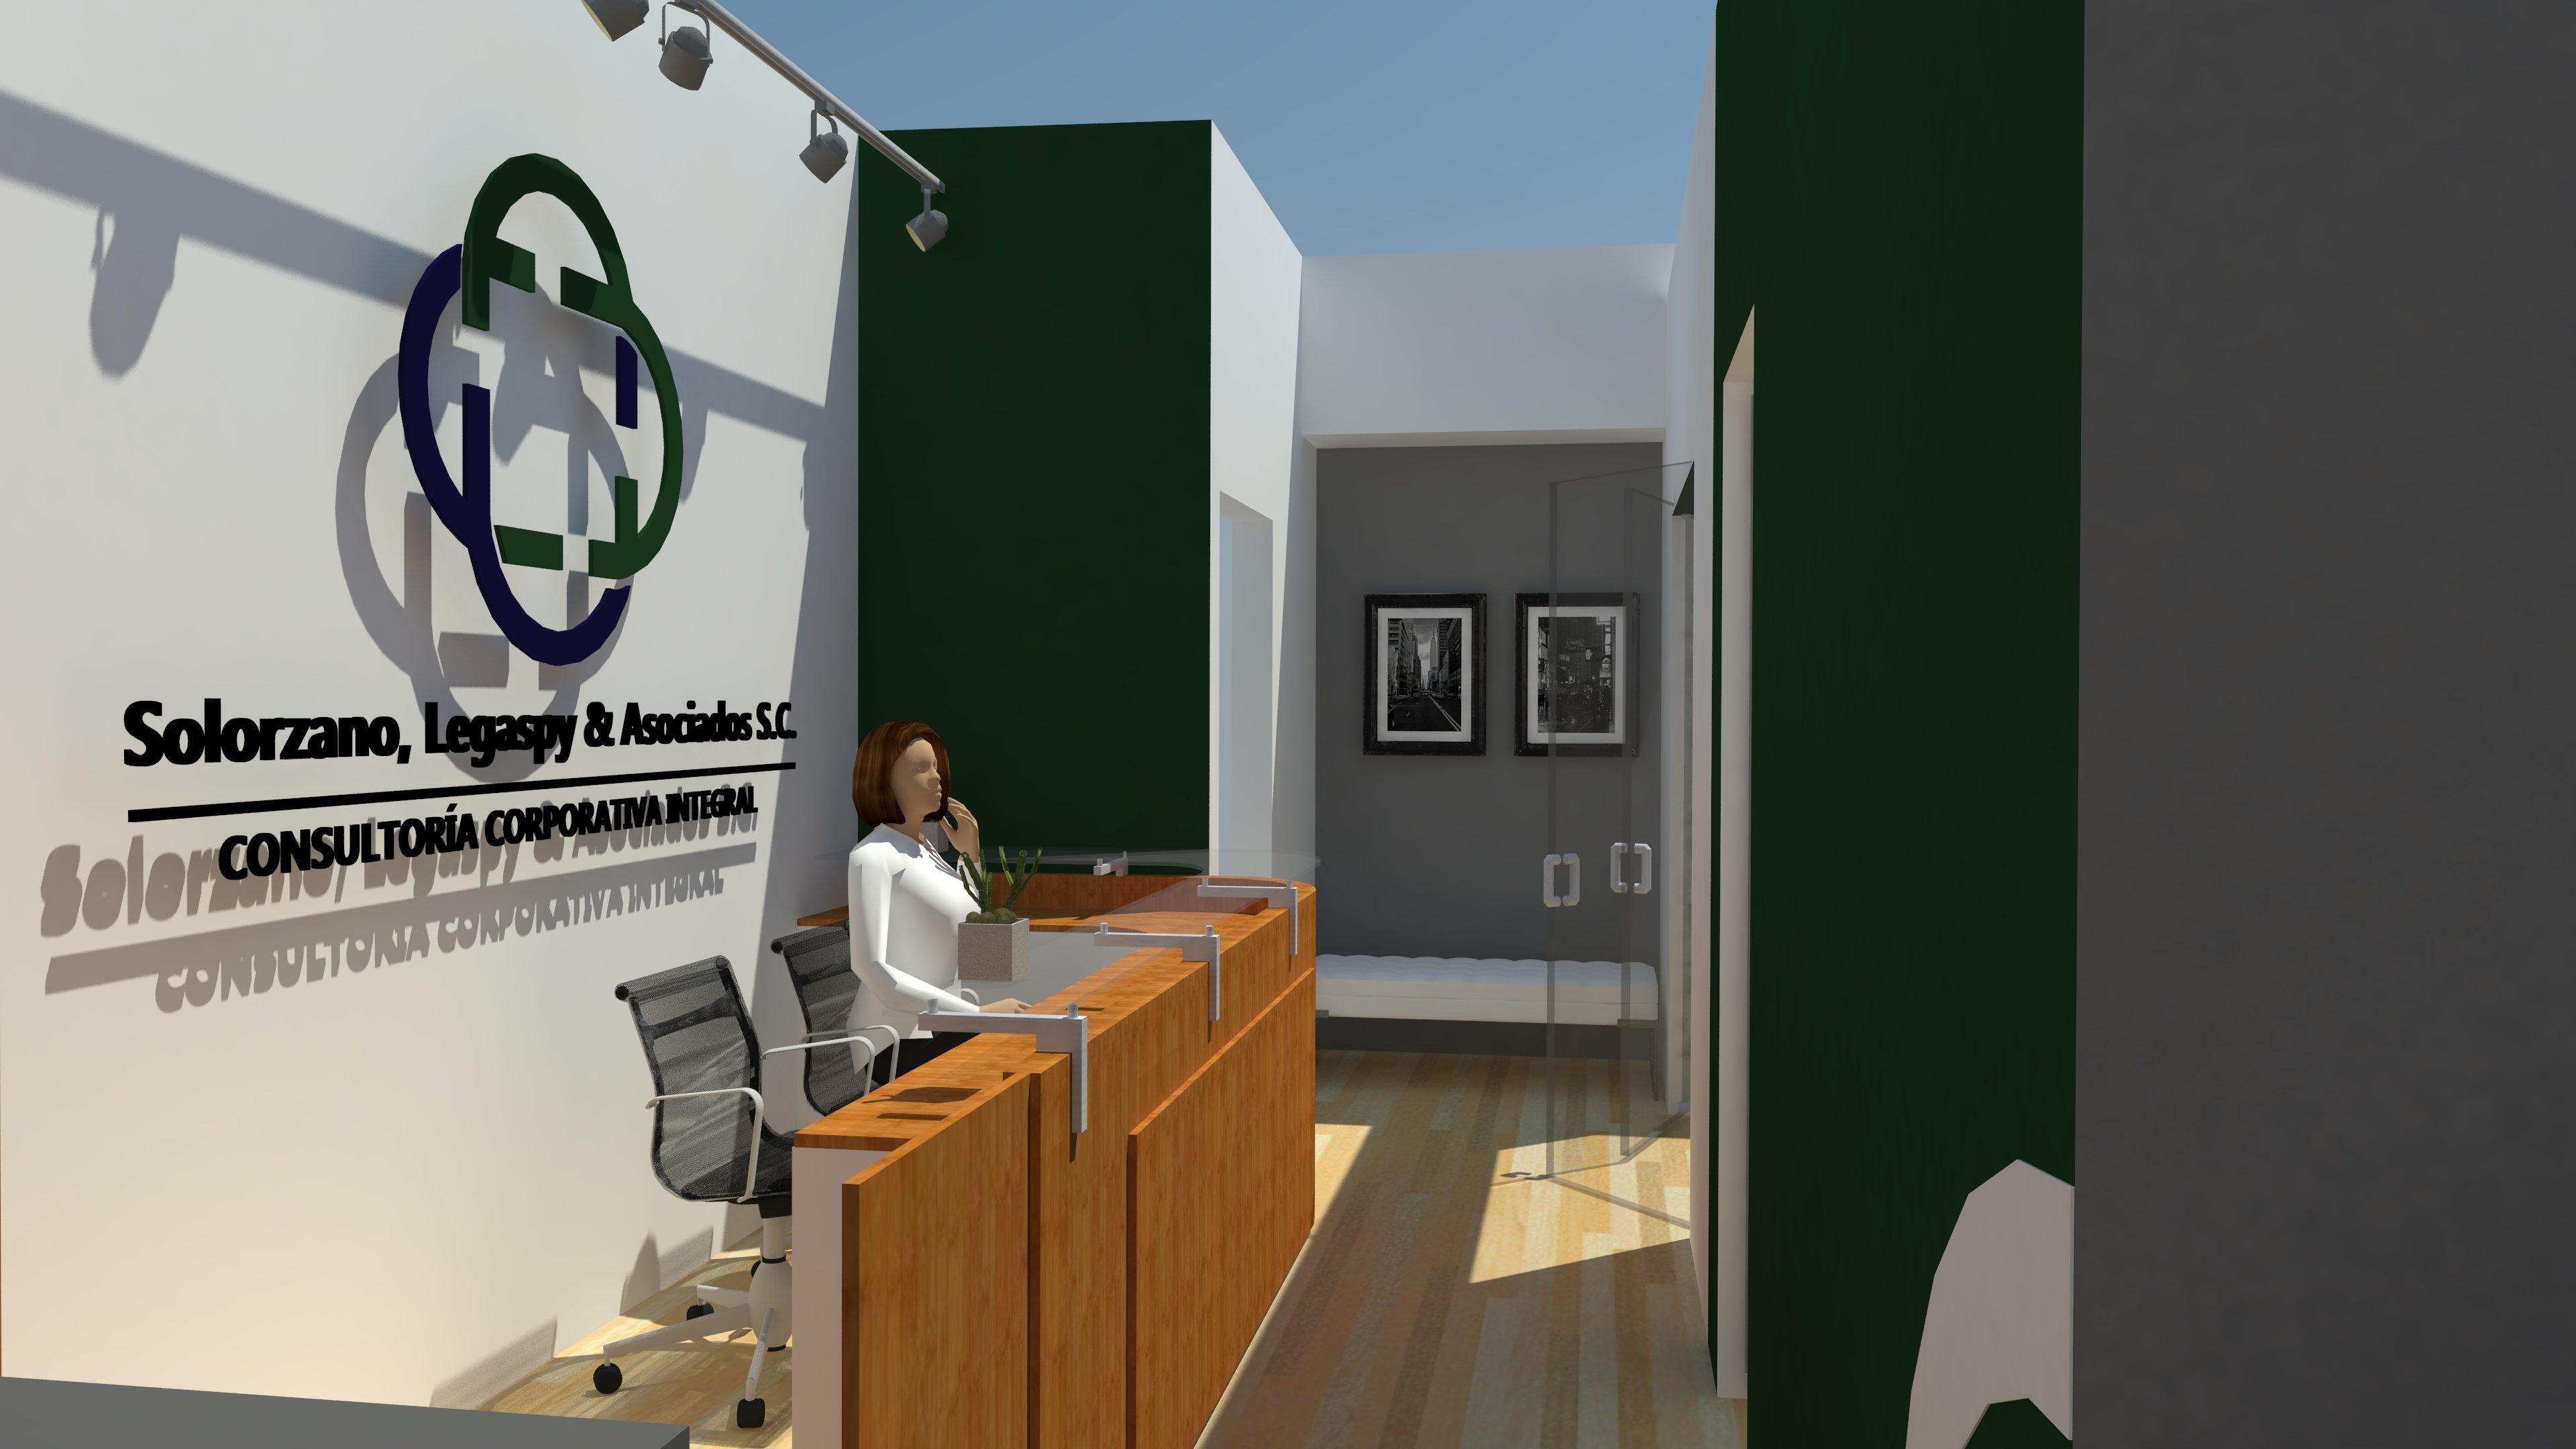 Oficina AB